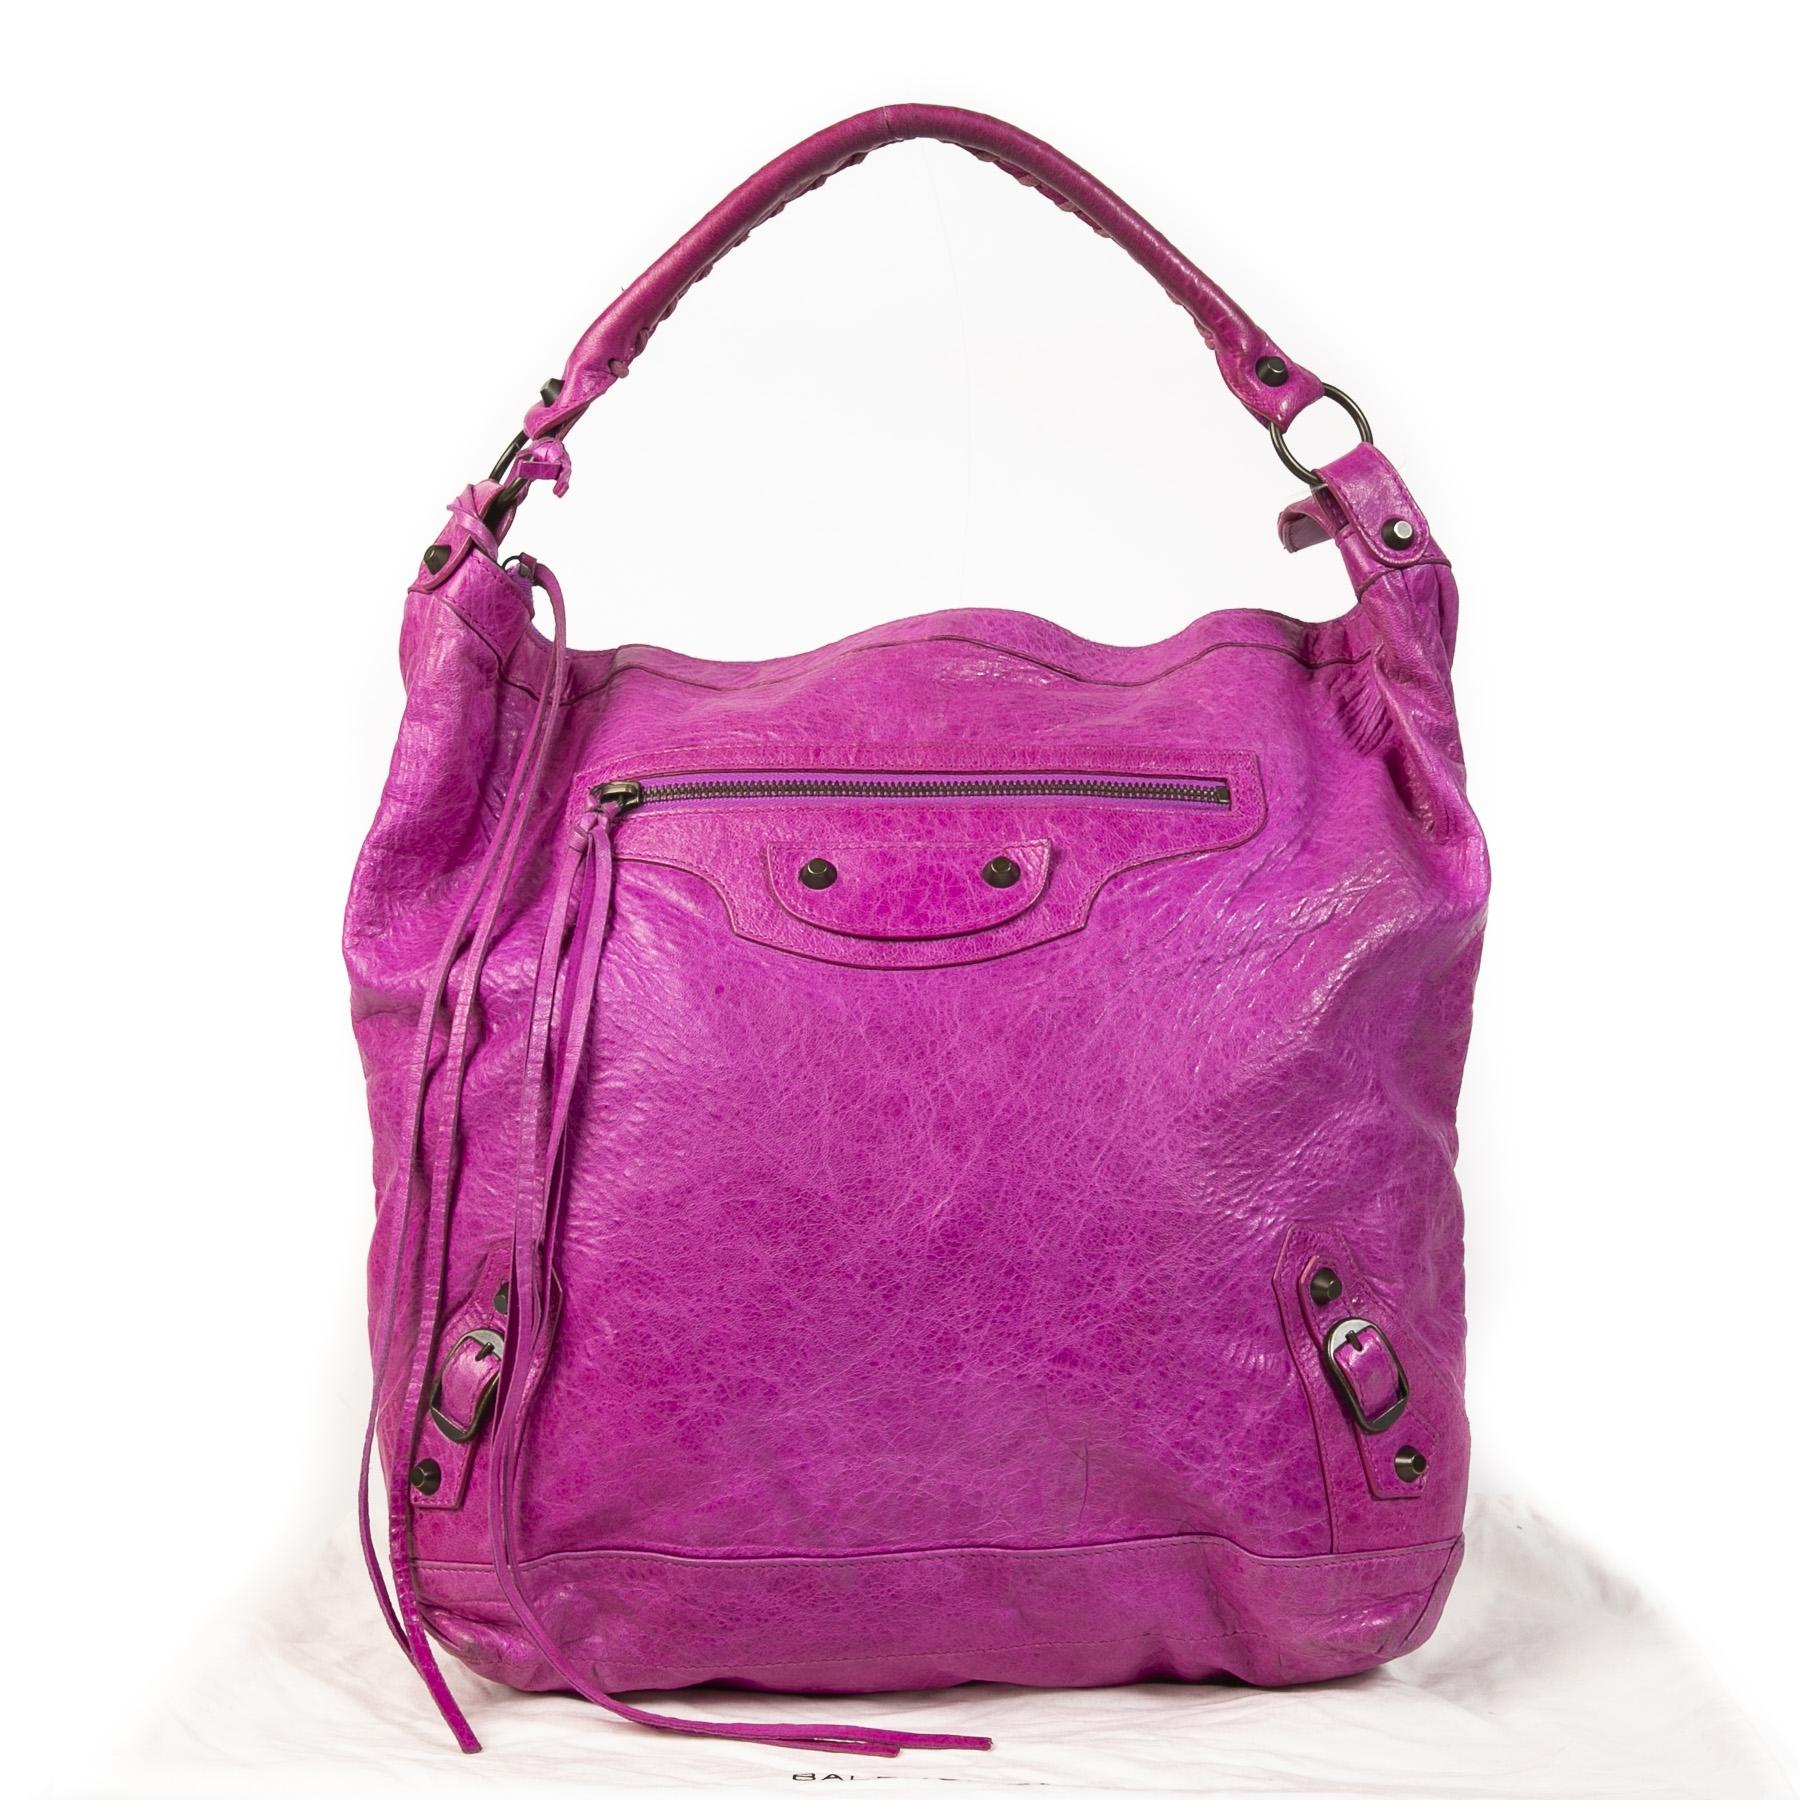 Balenciaga Fuchsia Classic Day Bag